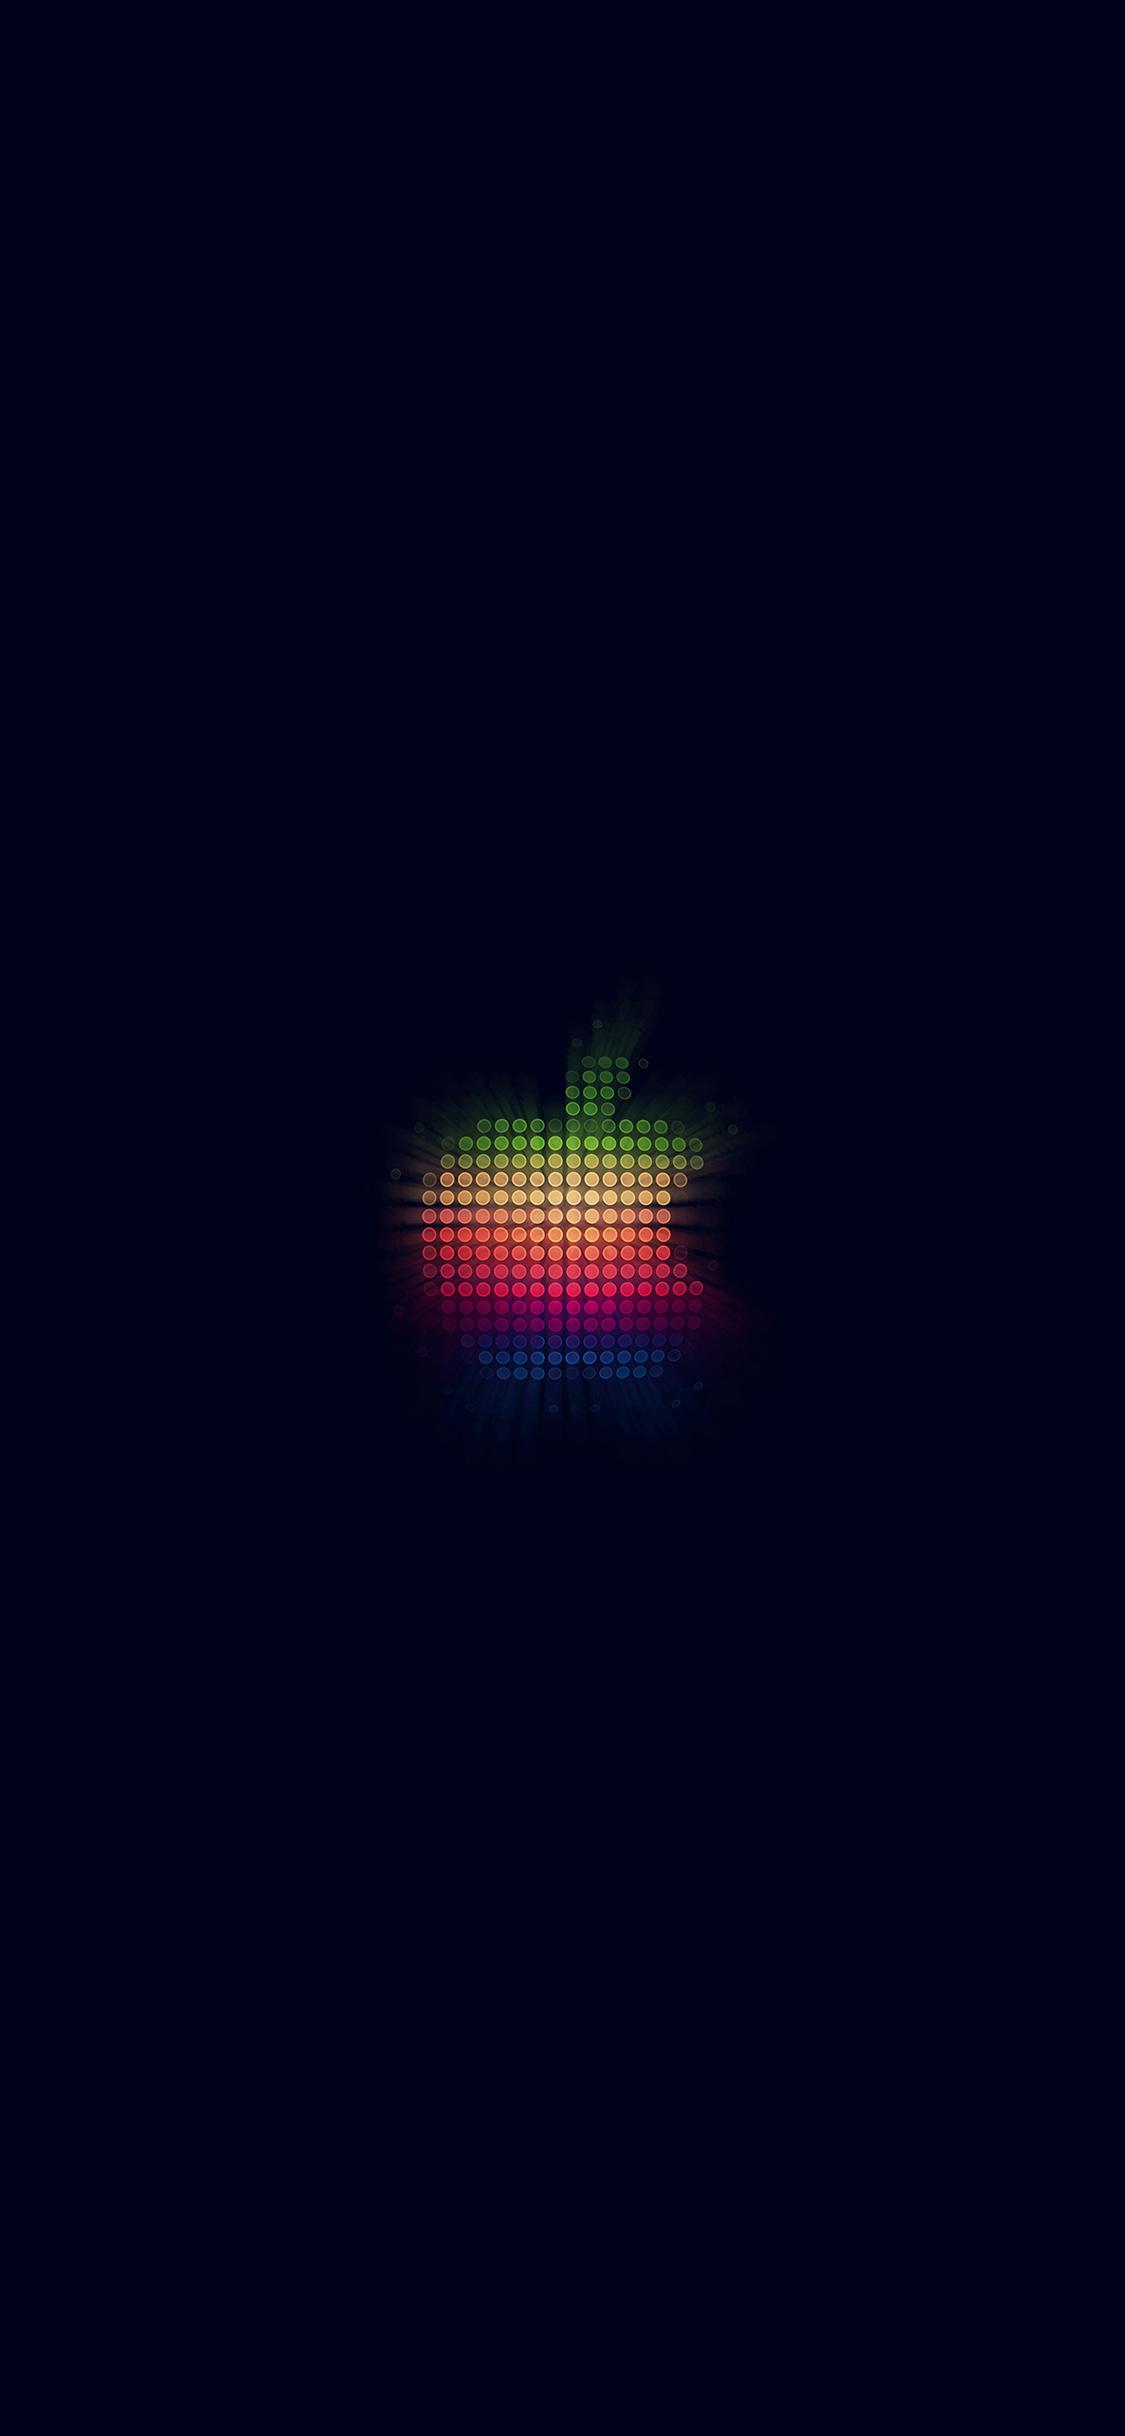 Iphonexpapers Iphone X Wallpaper At Logo Apple Rainbow Iltribuno Com